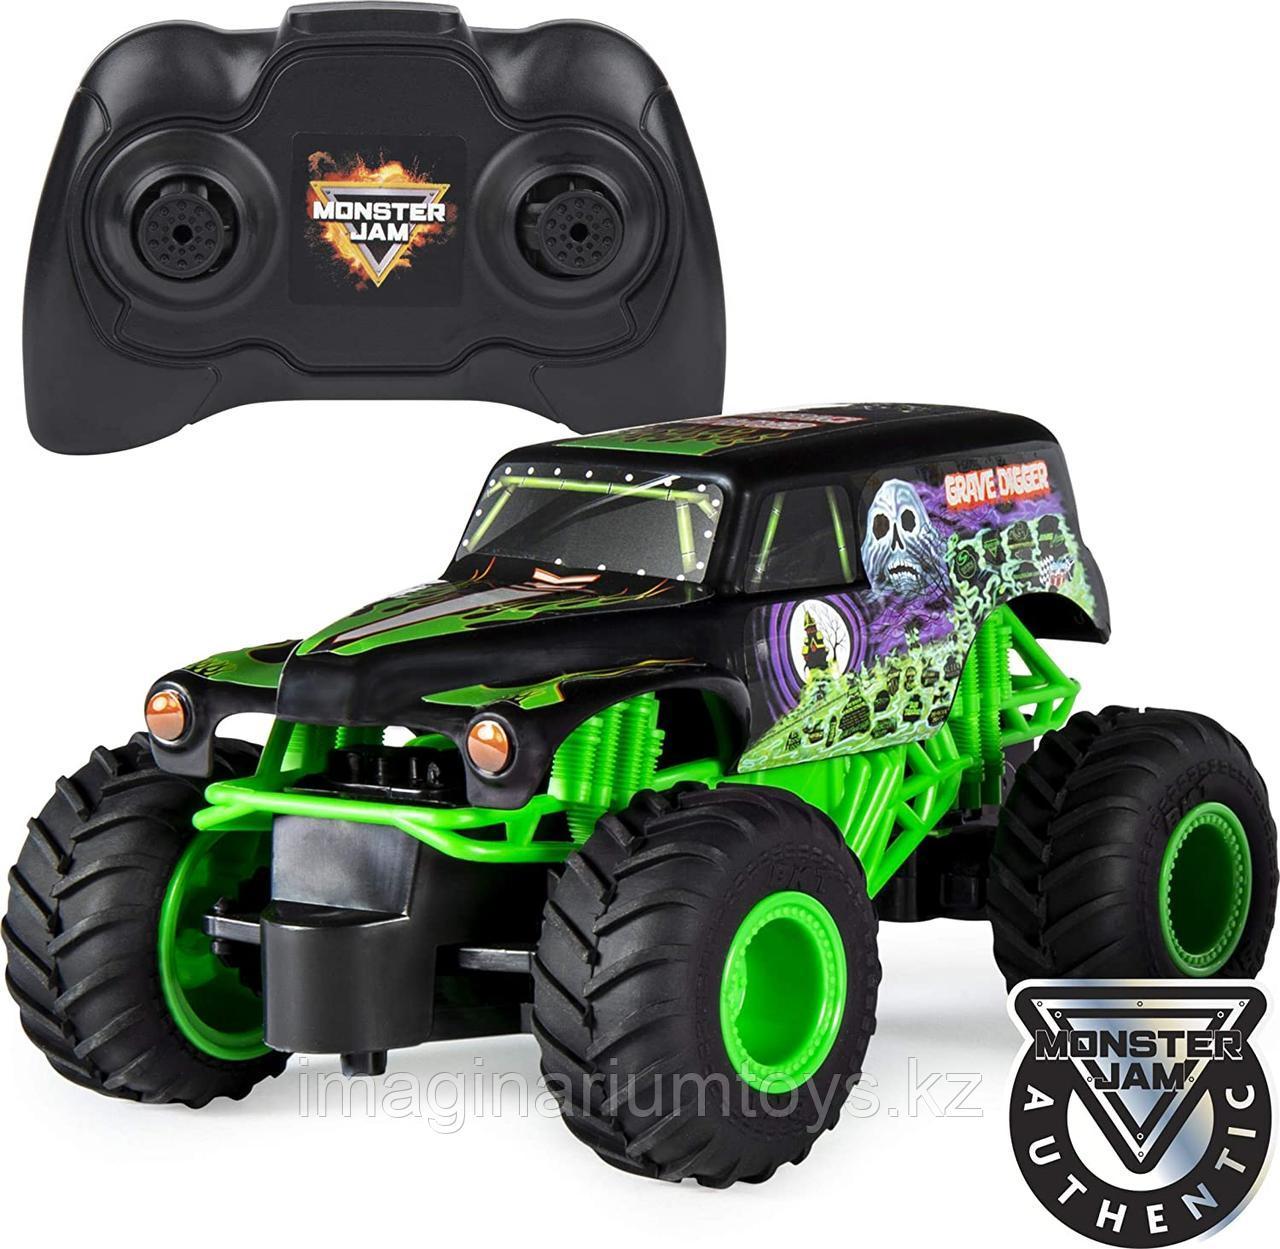 Машина на пульте управления Monster Jam Grave Digger масштаб 1:24